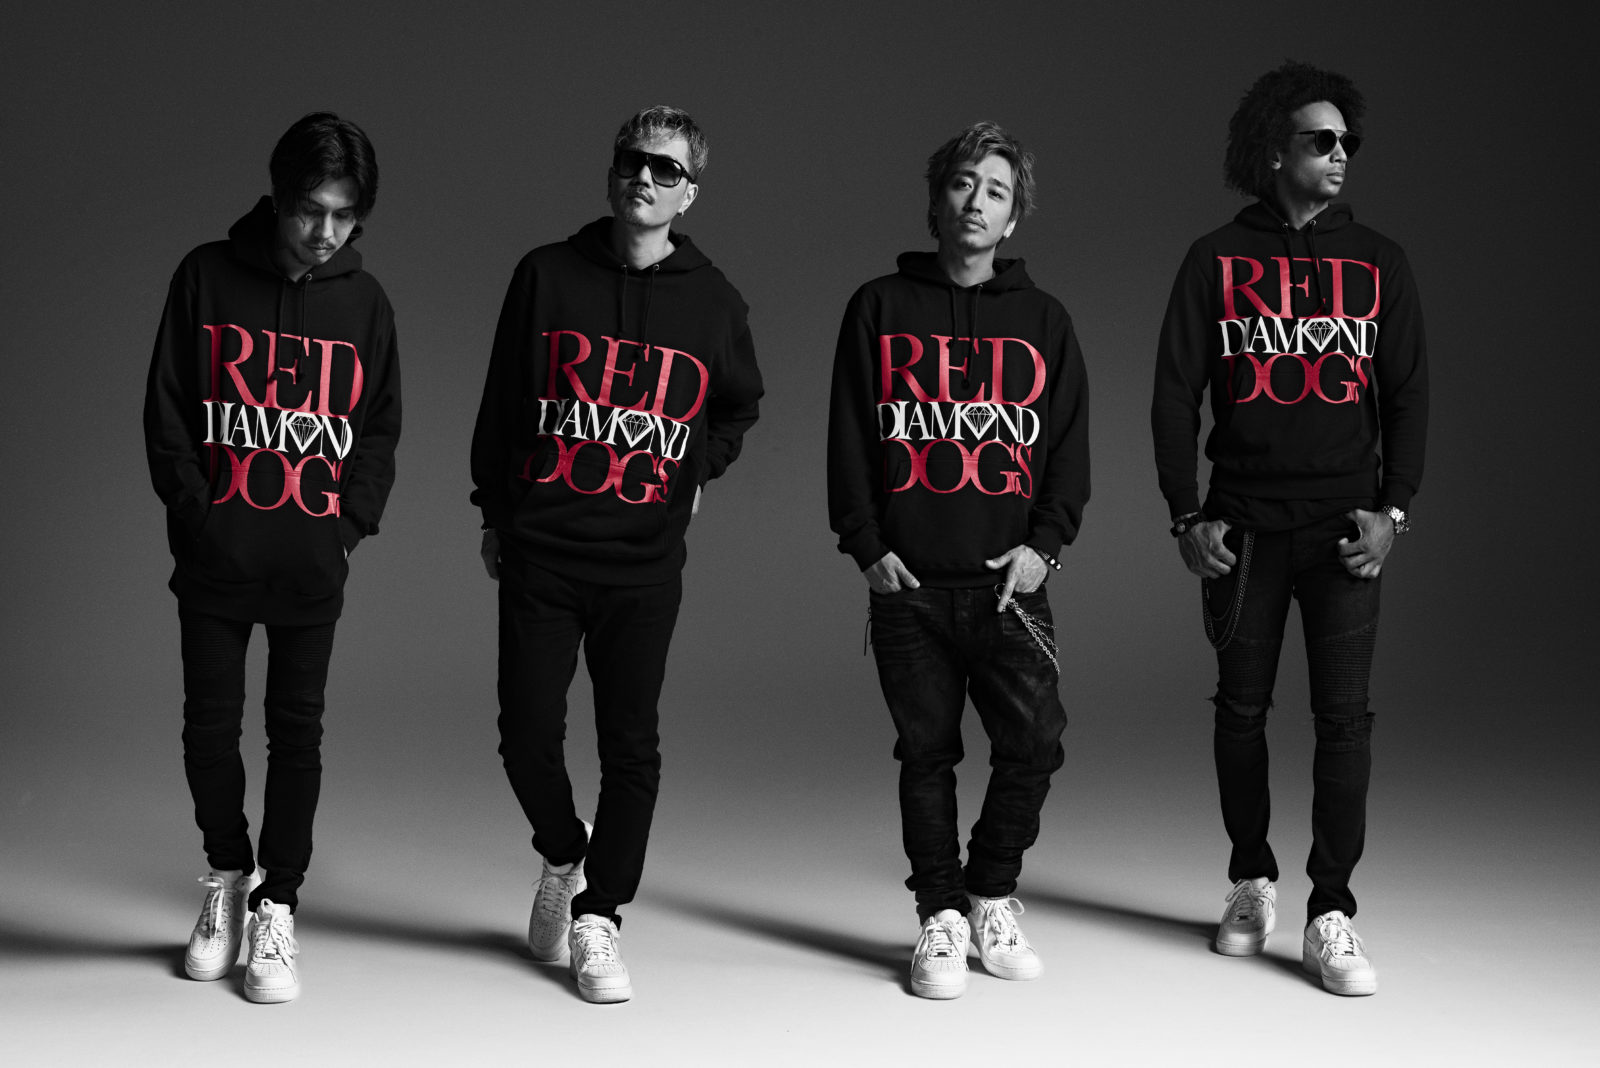 ATSUSHIから松坂選手への応援歌「RED SOUL BLUE DRAGON」ミュージックビデオ解禁サムネイル画像